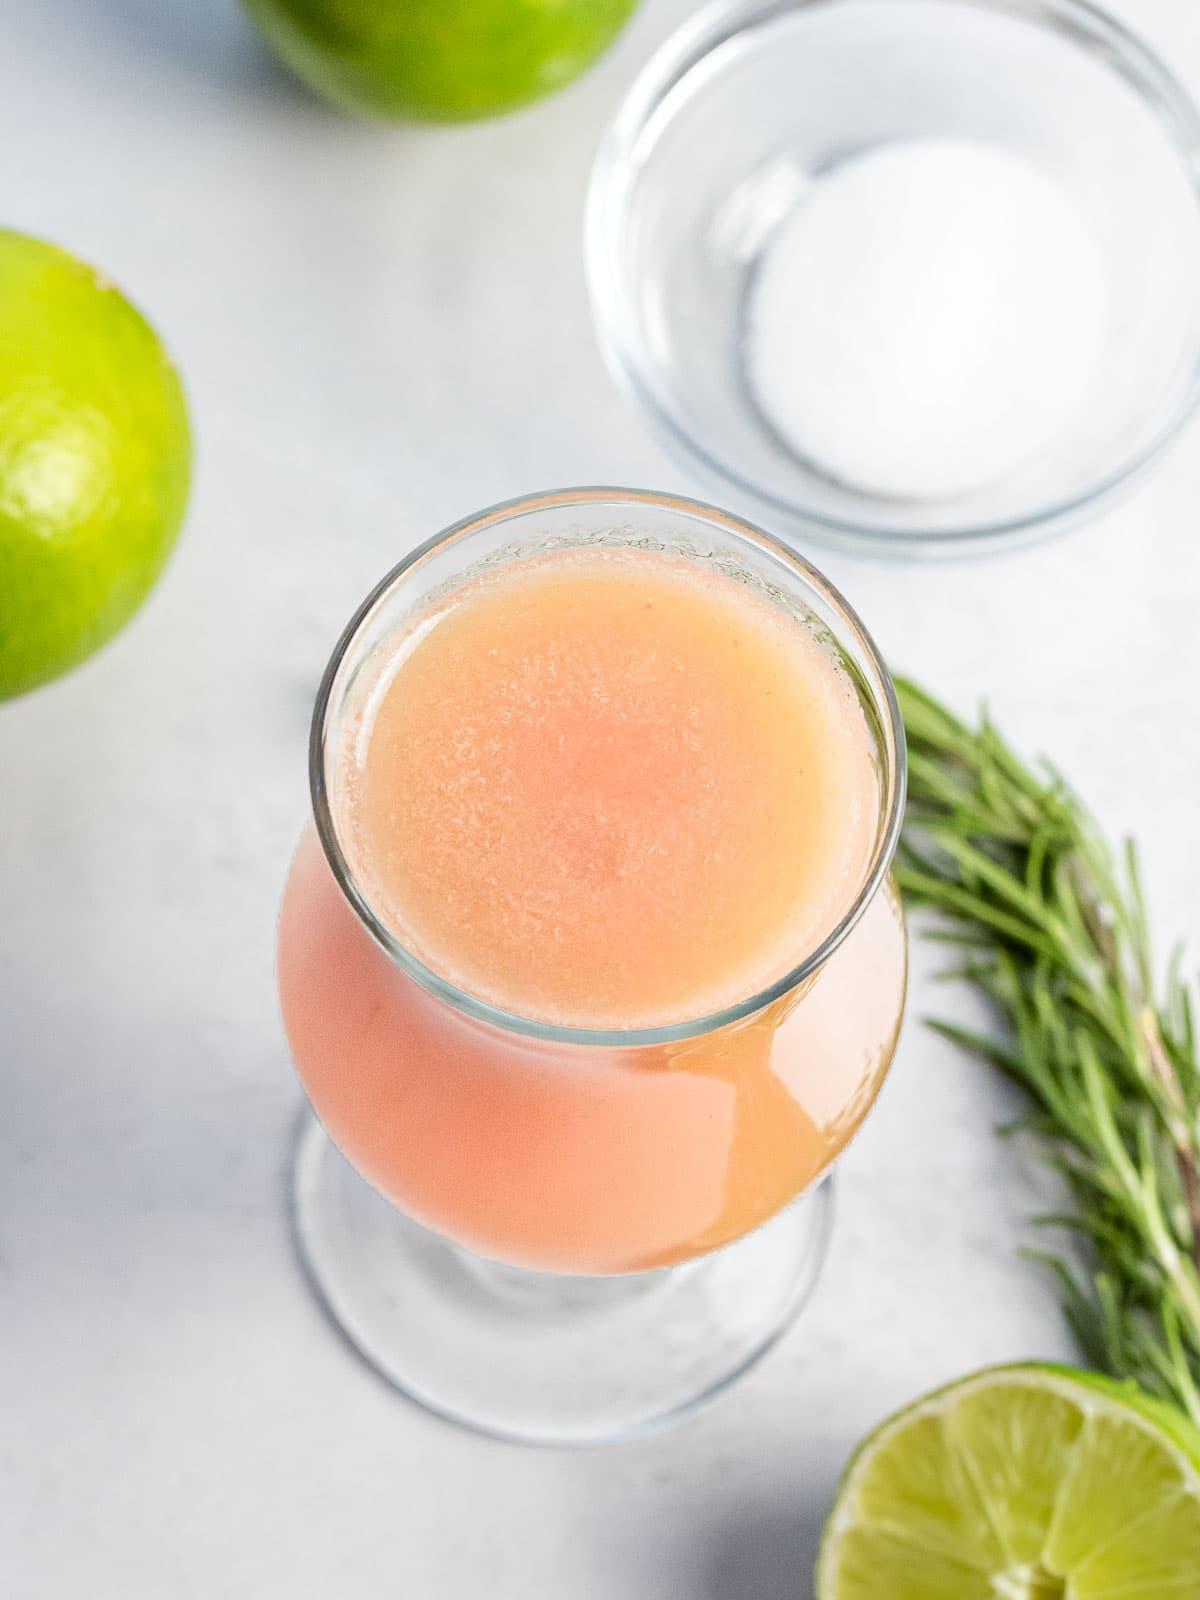 white peach agua fresca in a glass next to lime, sugar, and herbs